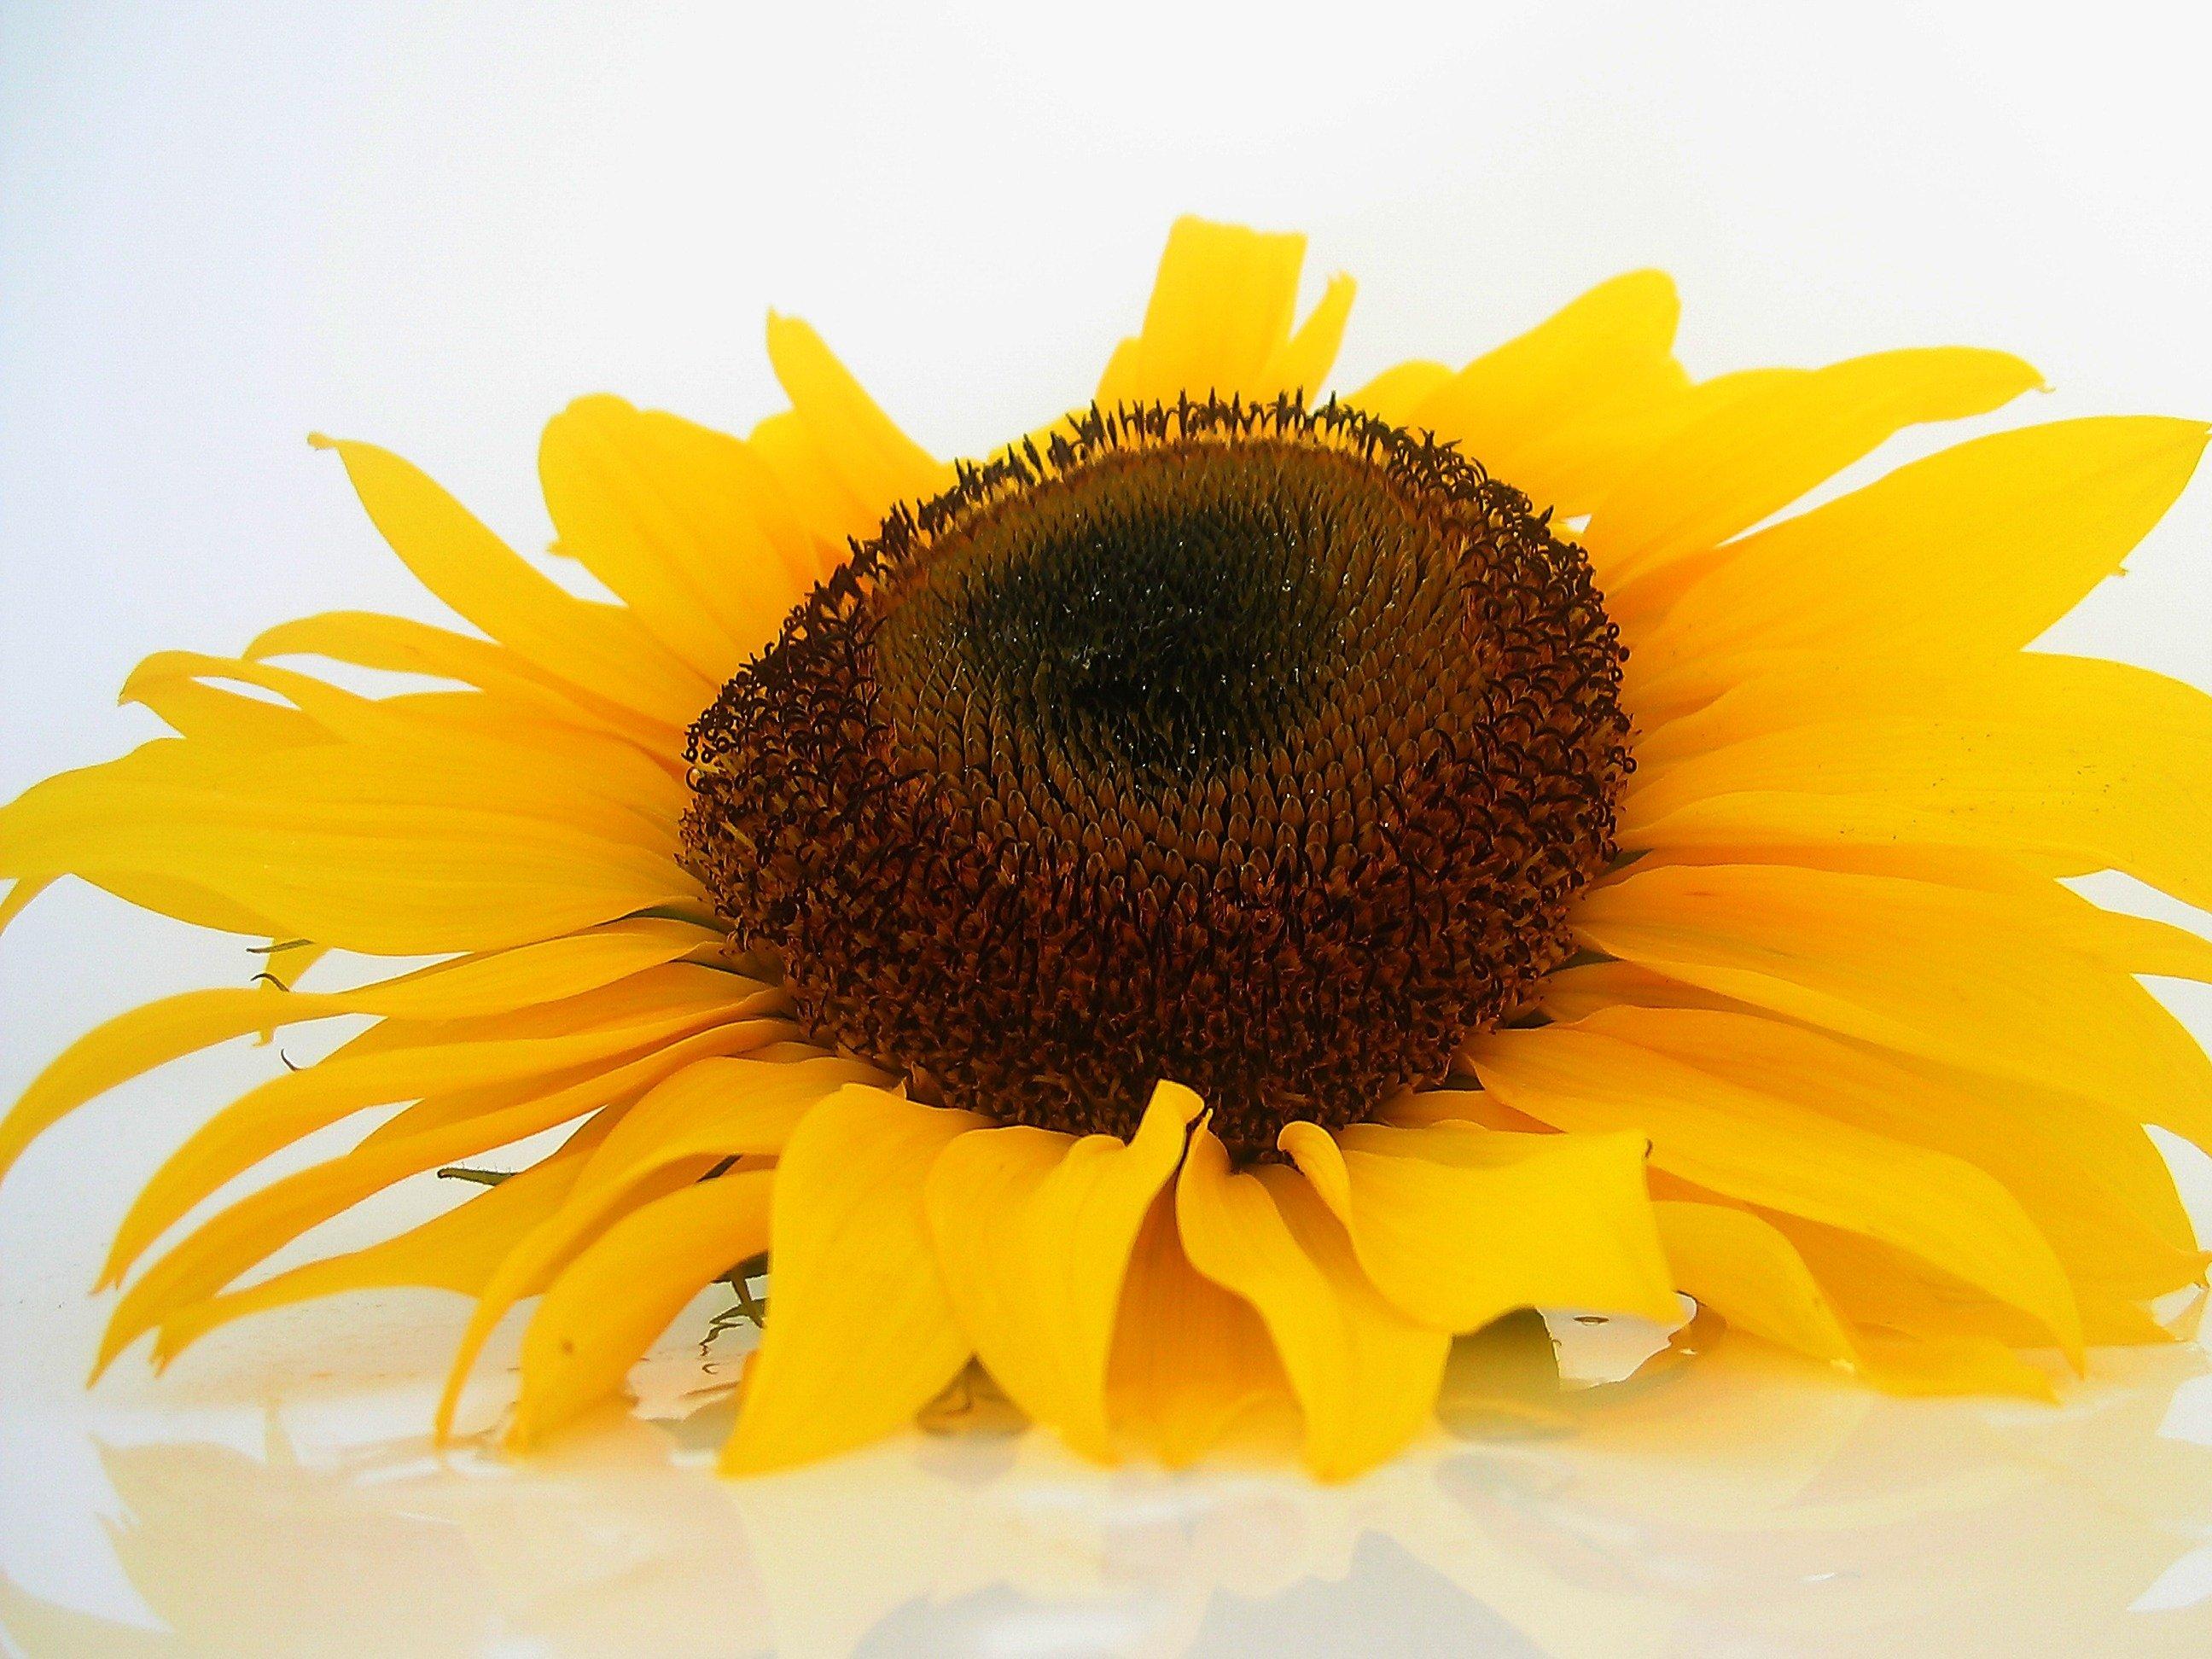 200 Sunflower Photoshop Overlays  Backdrops  Backgrounds